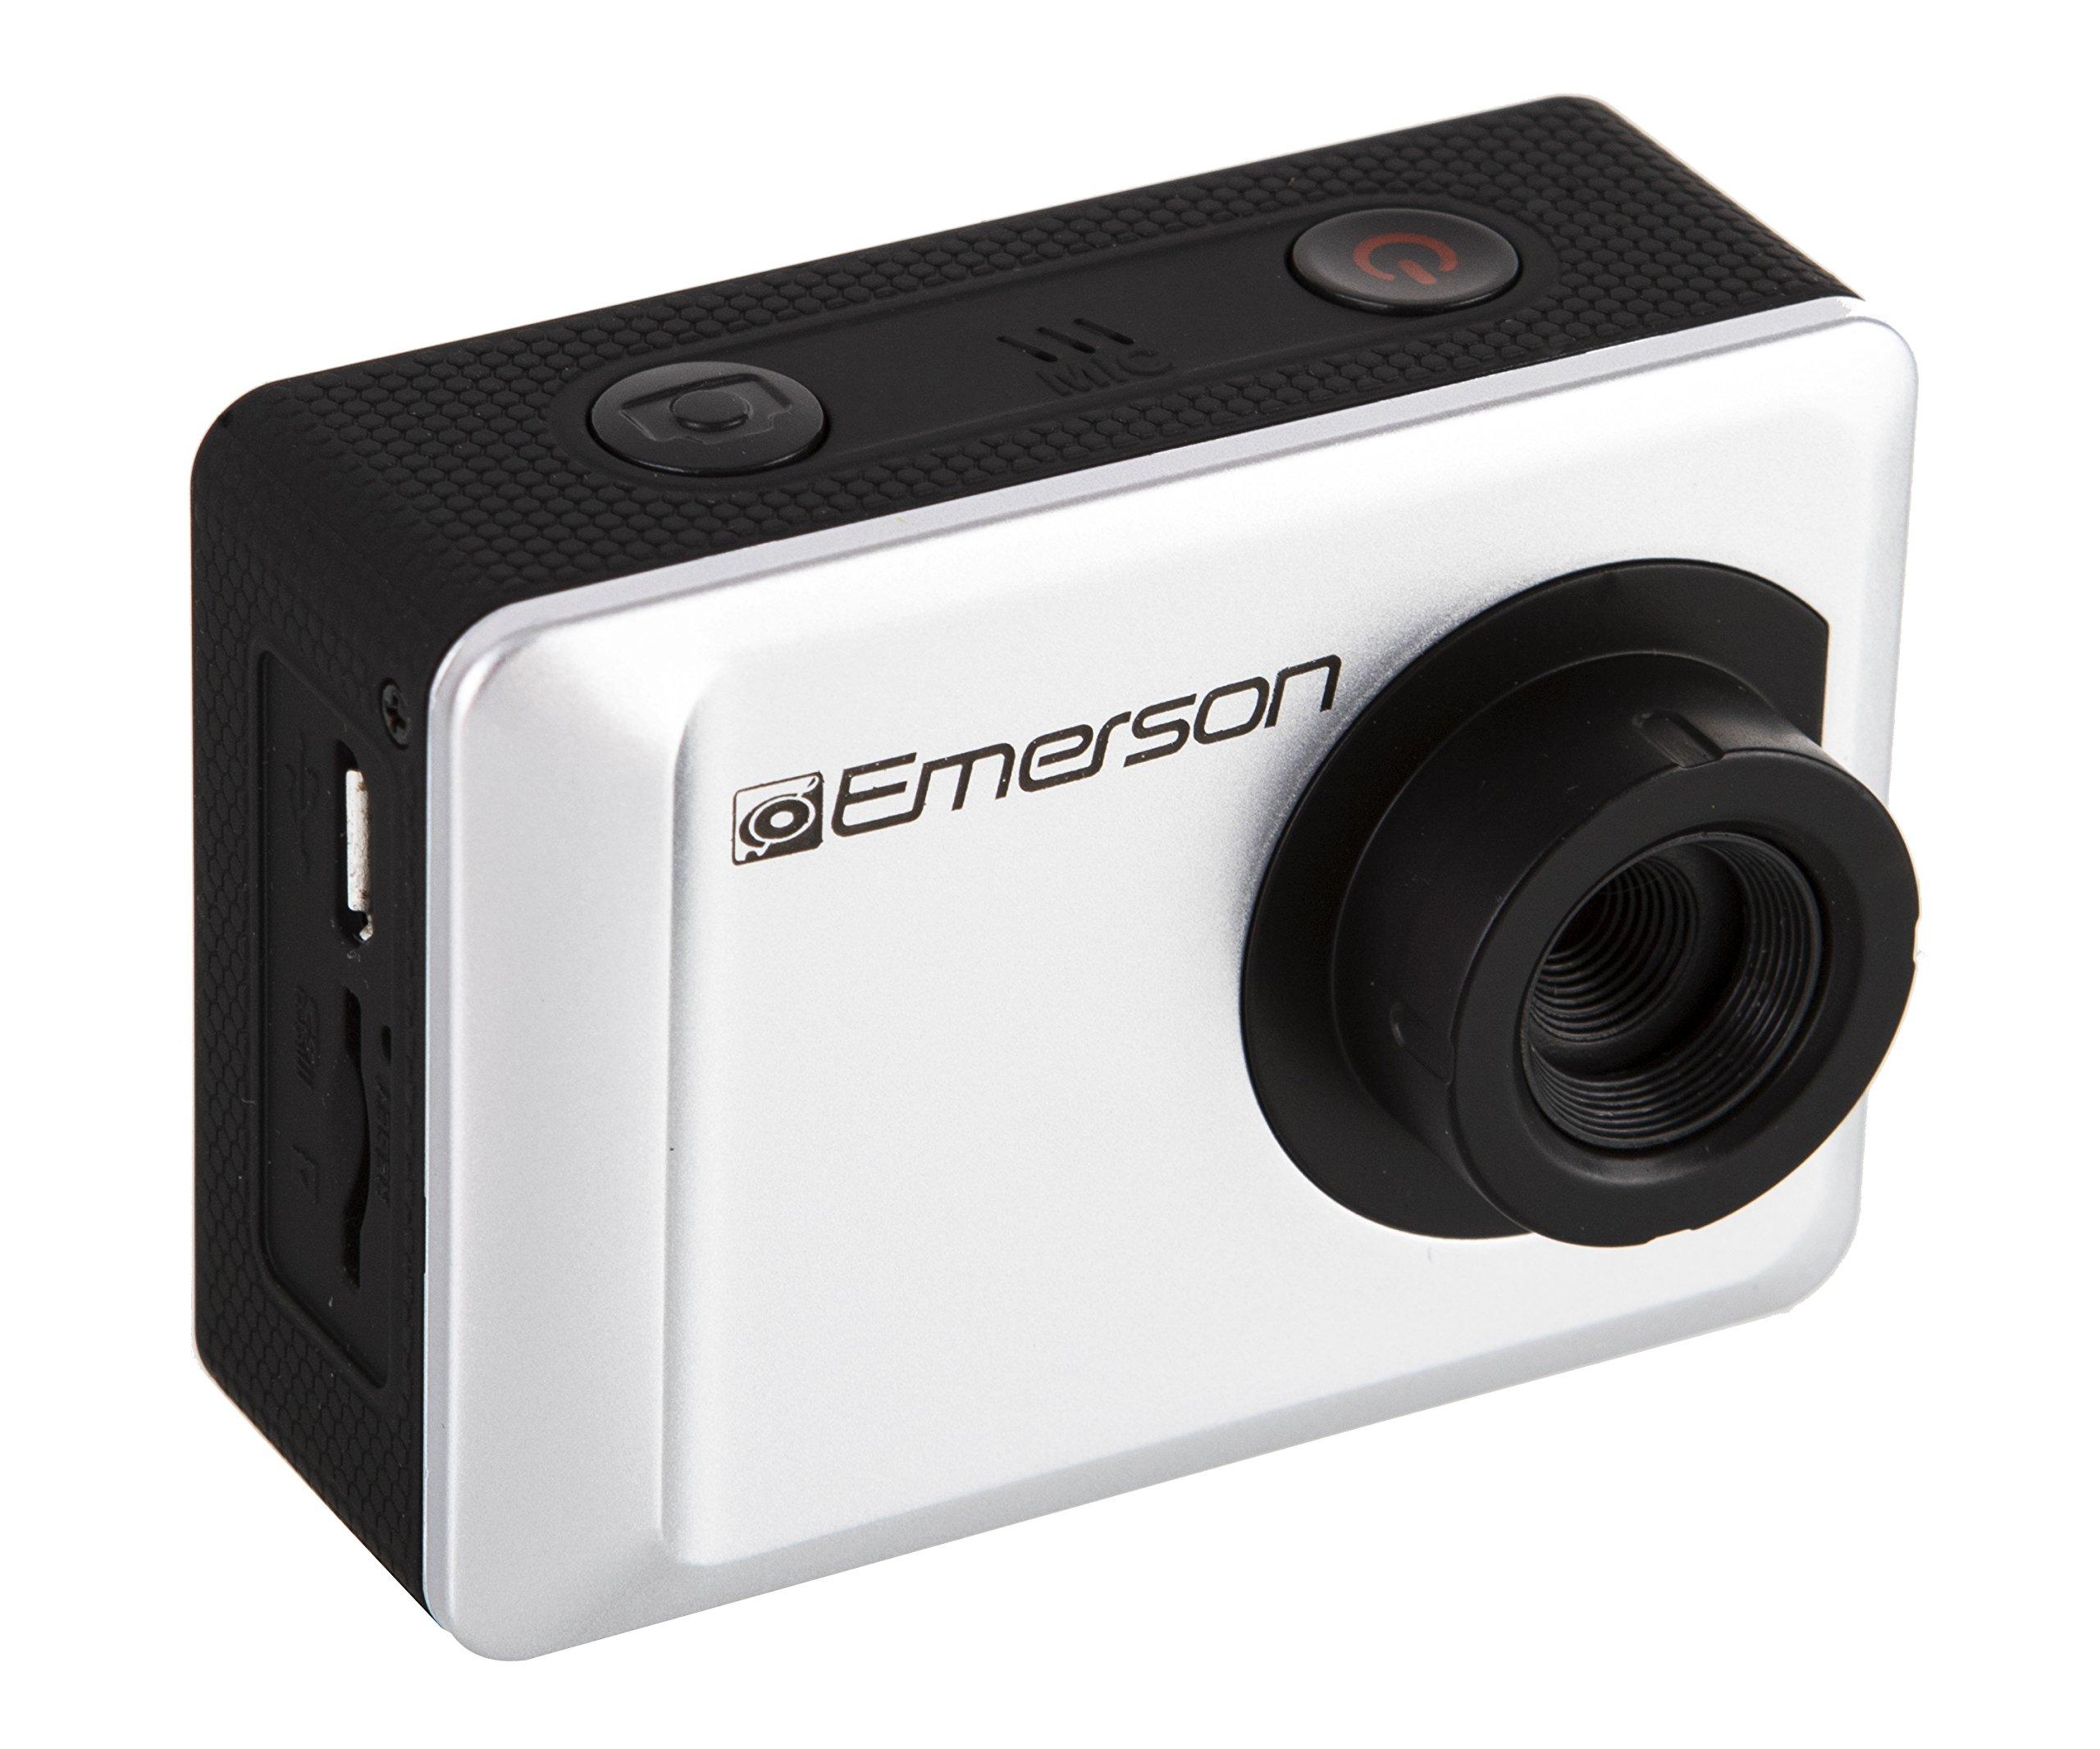 Emerson EVC655SL 1080P HD Action Cam, 2'' Display, 12 megapixel